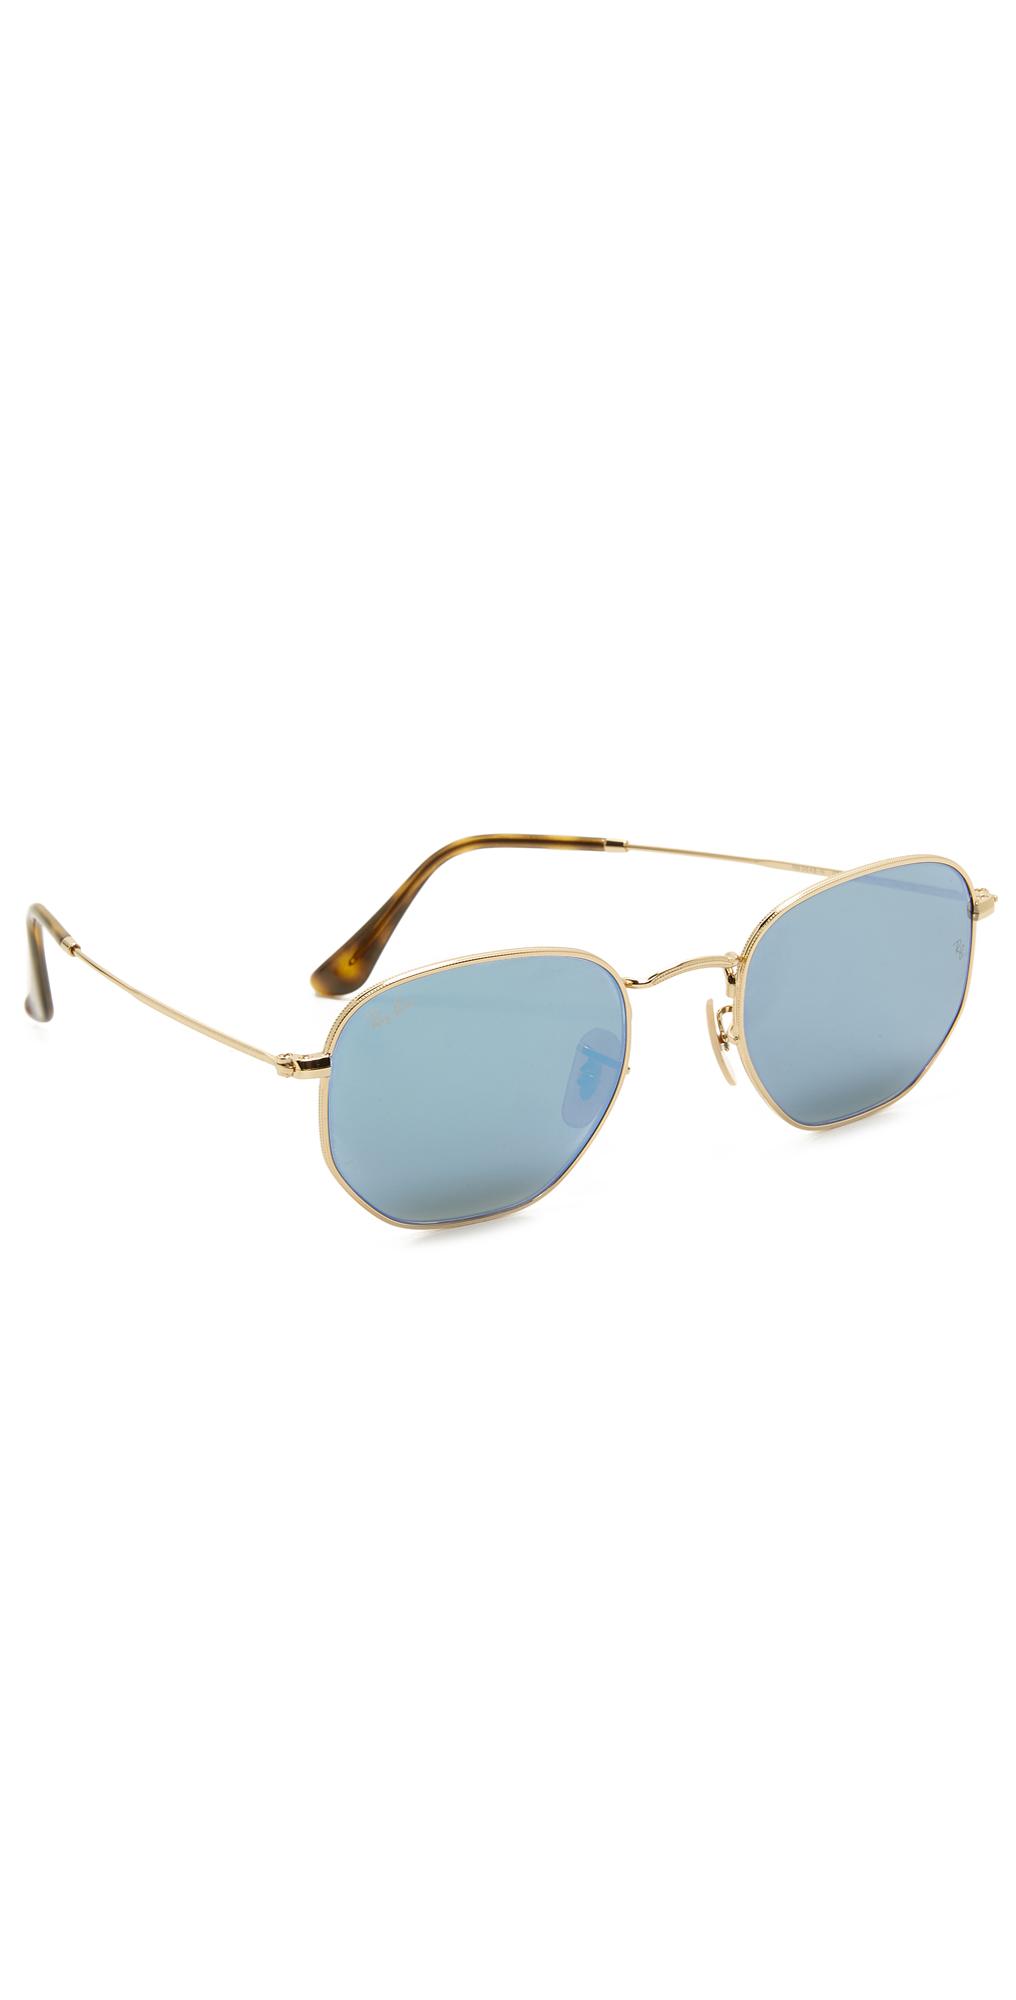 Octagon Mirrored Sunglasses Ray-Ban